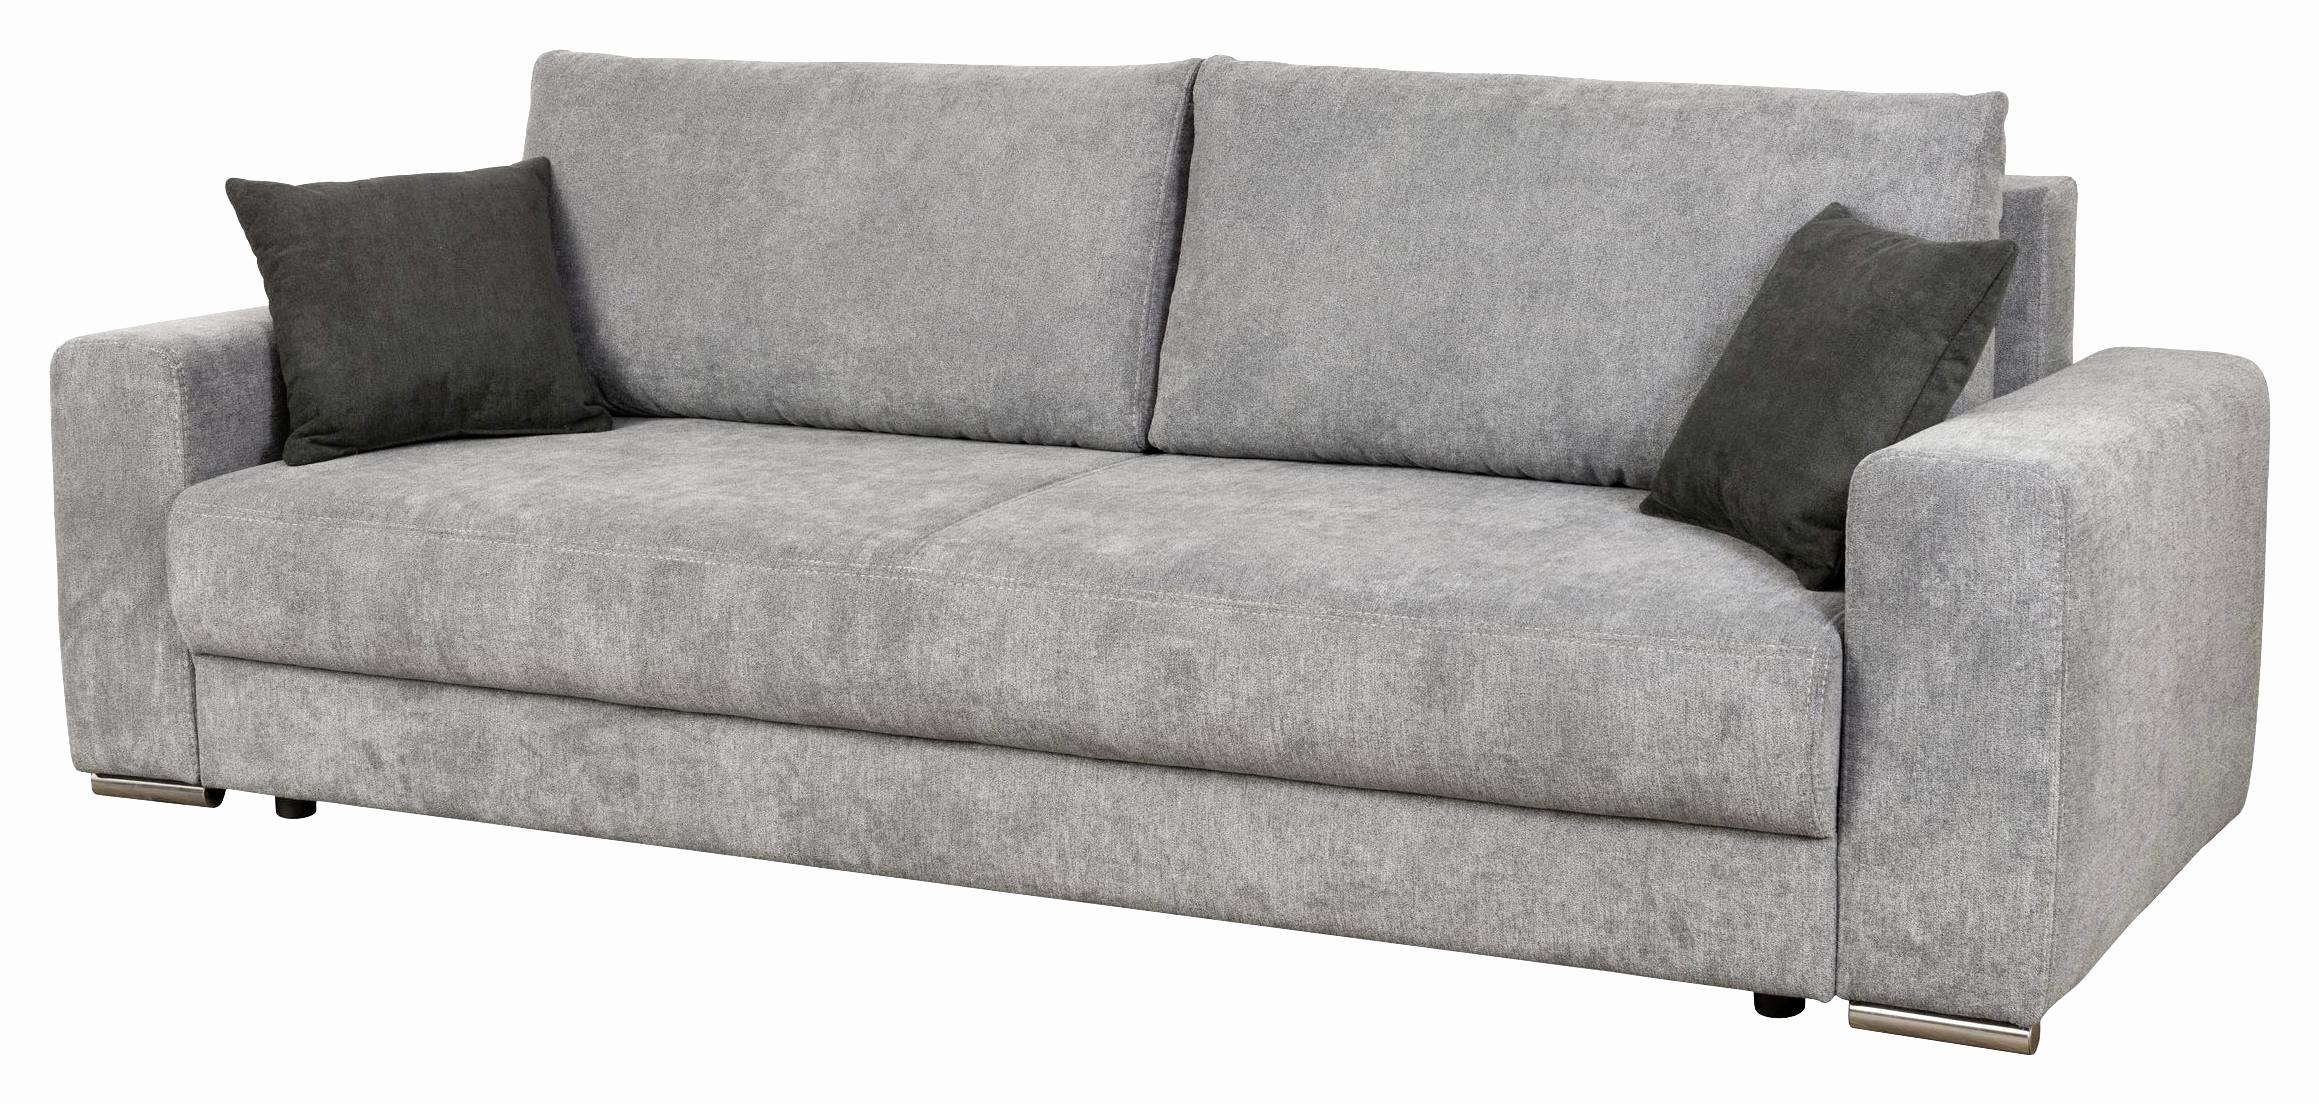 Full Size of Alcantara Sofa Reinigung Schn 50 Elegant Couch Reinigen Kare Esstisch Schlaffunktion Big Kolonialstil Poco Chesterfield Grau Himolla Weißes Echtleder Sofa Alcantara Sofa